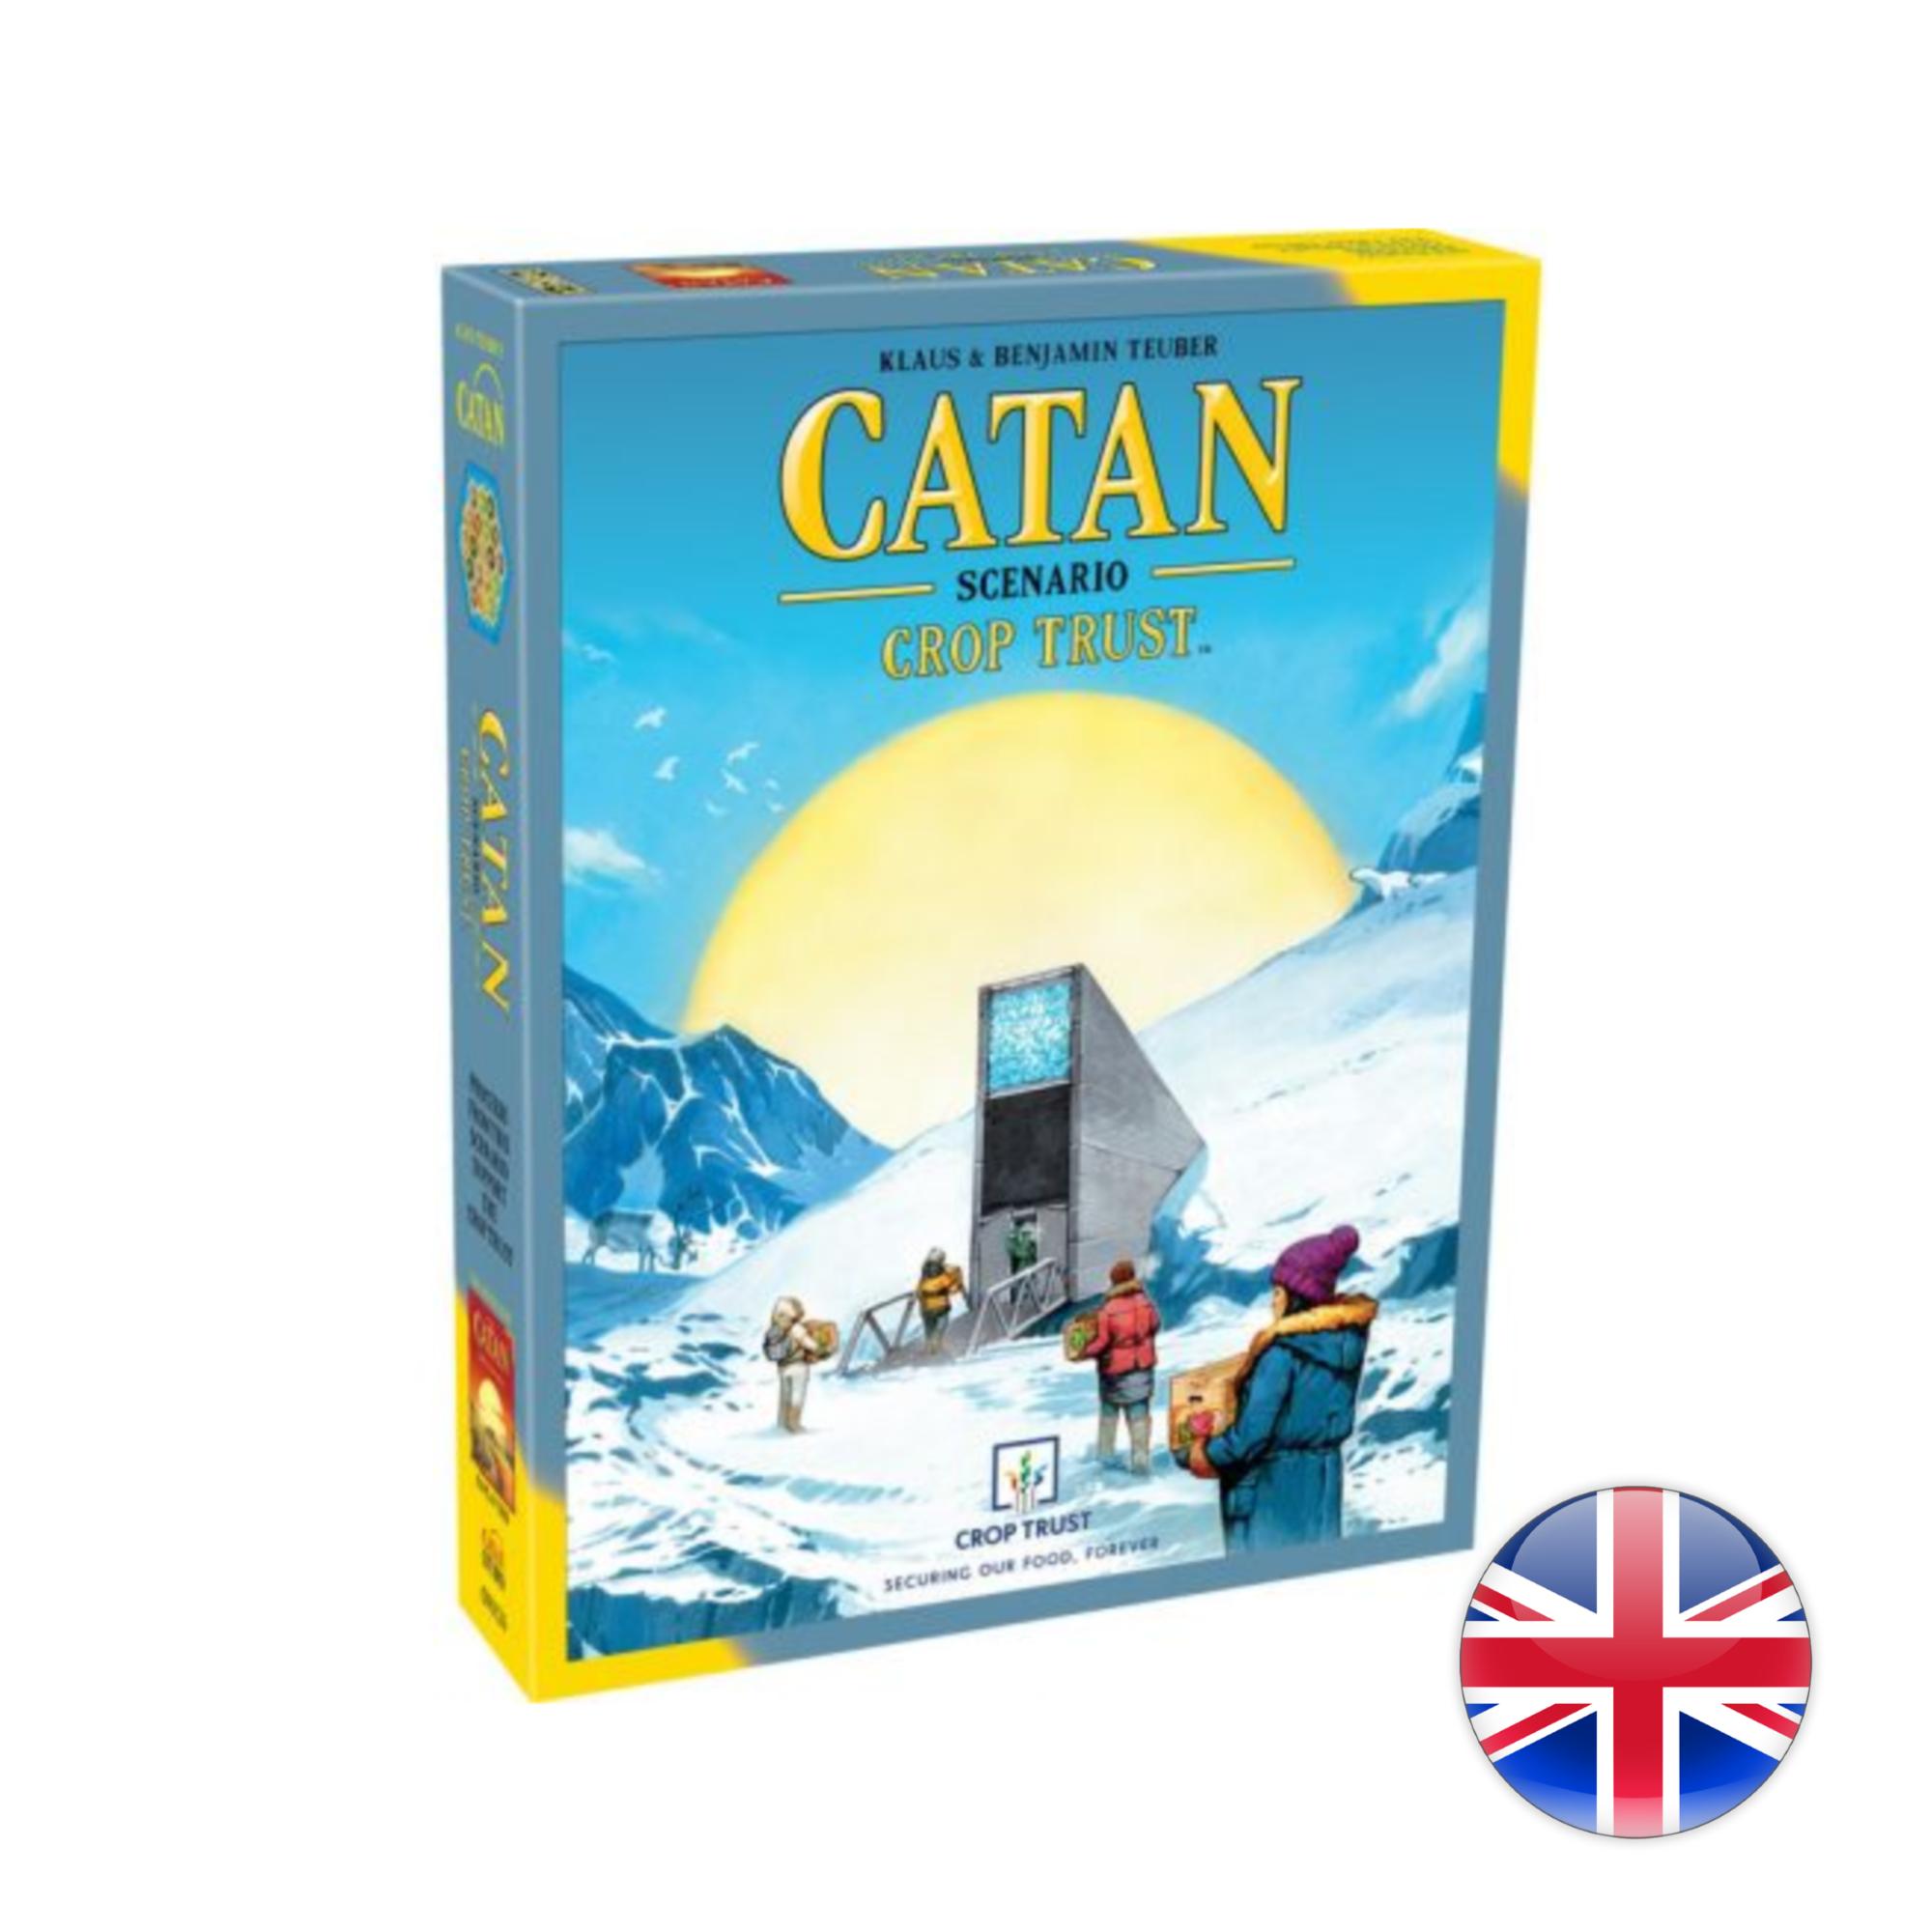 Catan Studios Catan Scenario - Crop Trust